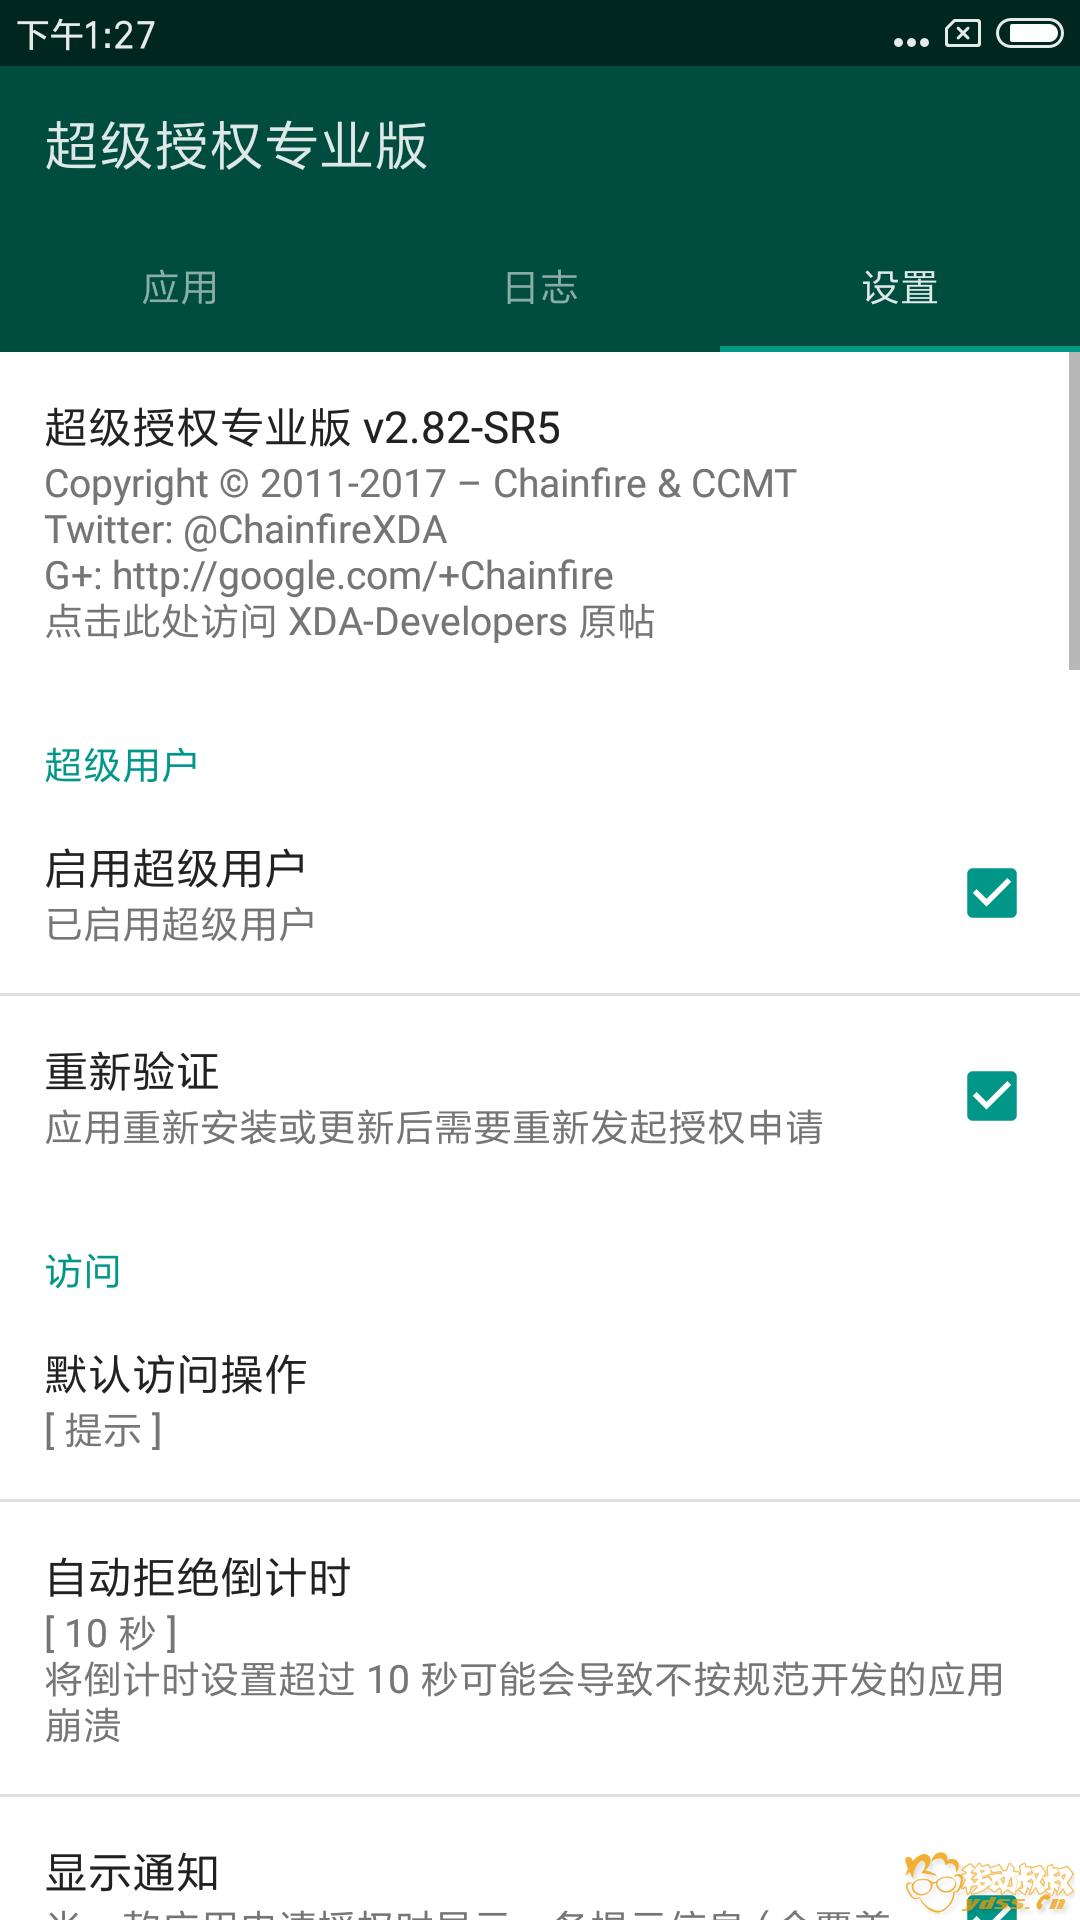 Screenshot_2018-09-25-13-27-36-604_eu.chainfire.supersu.png